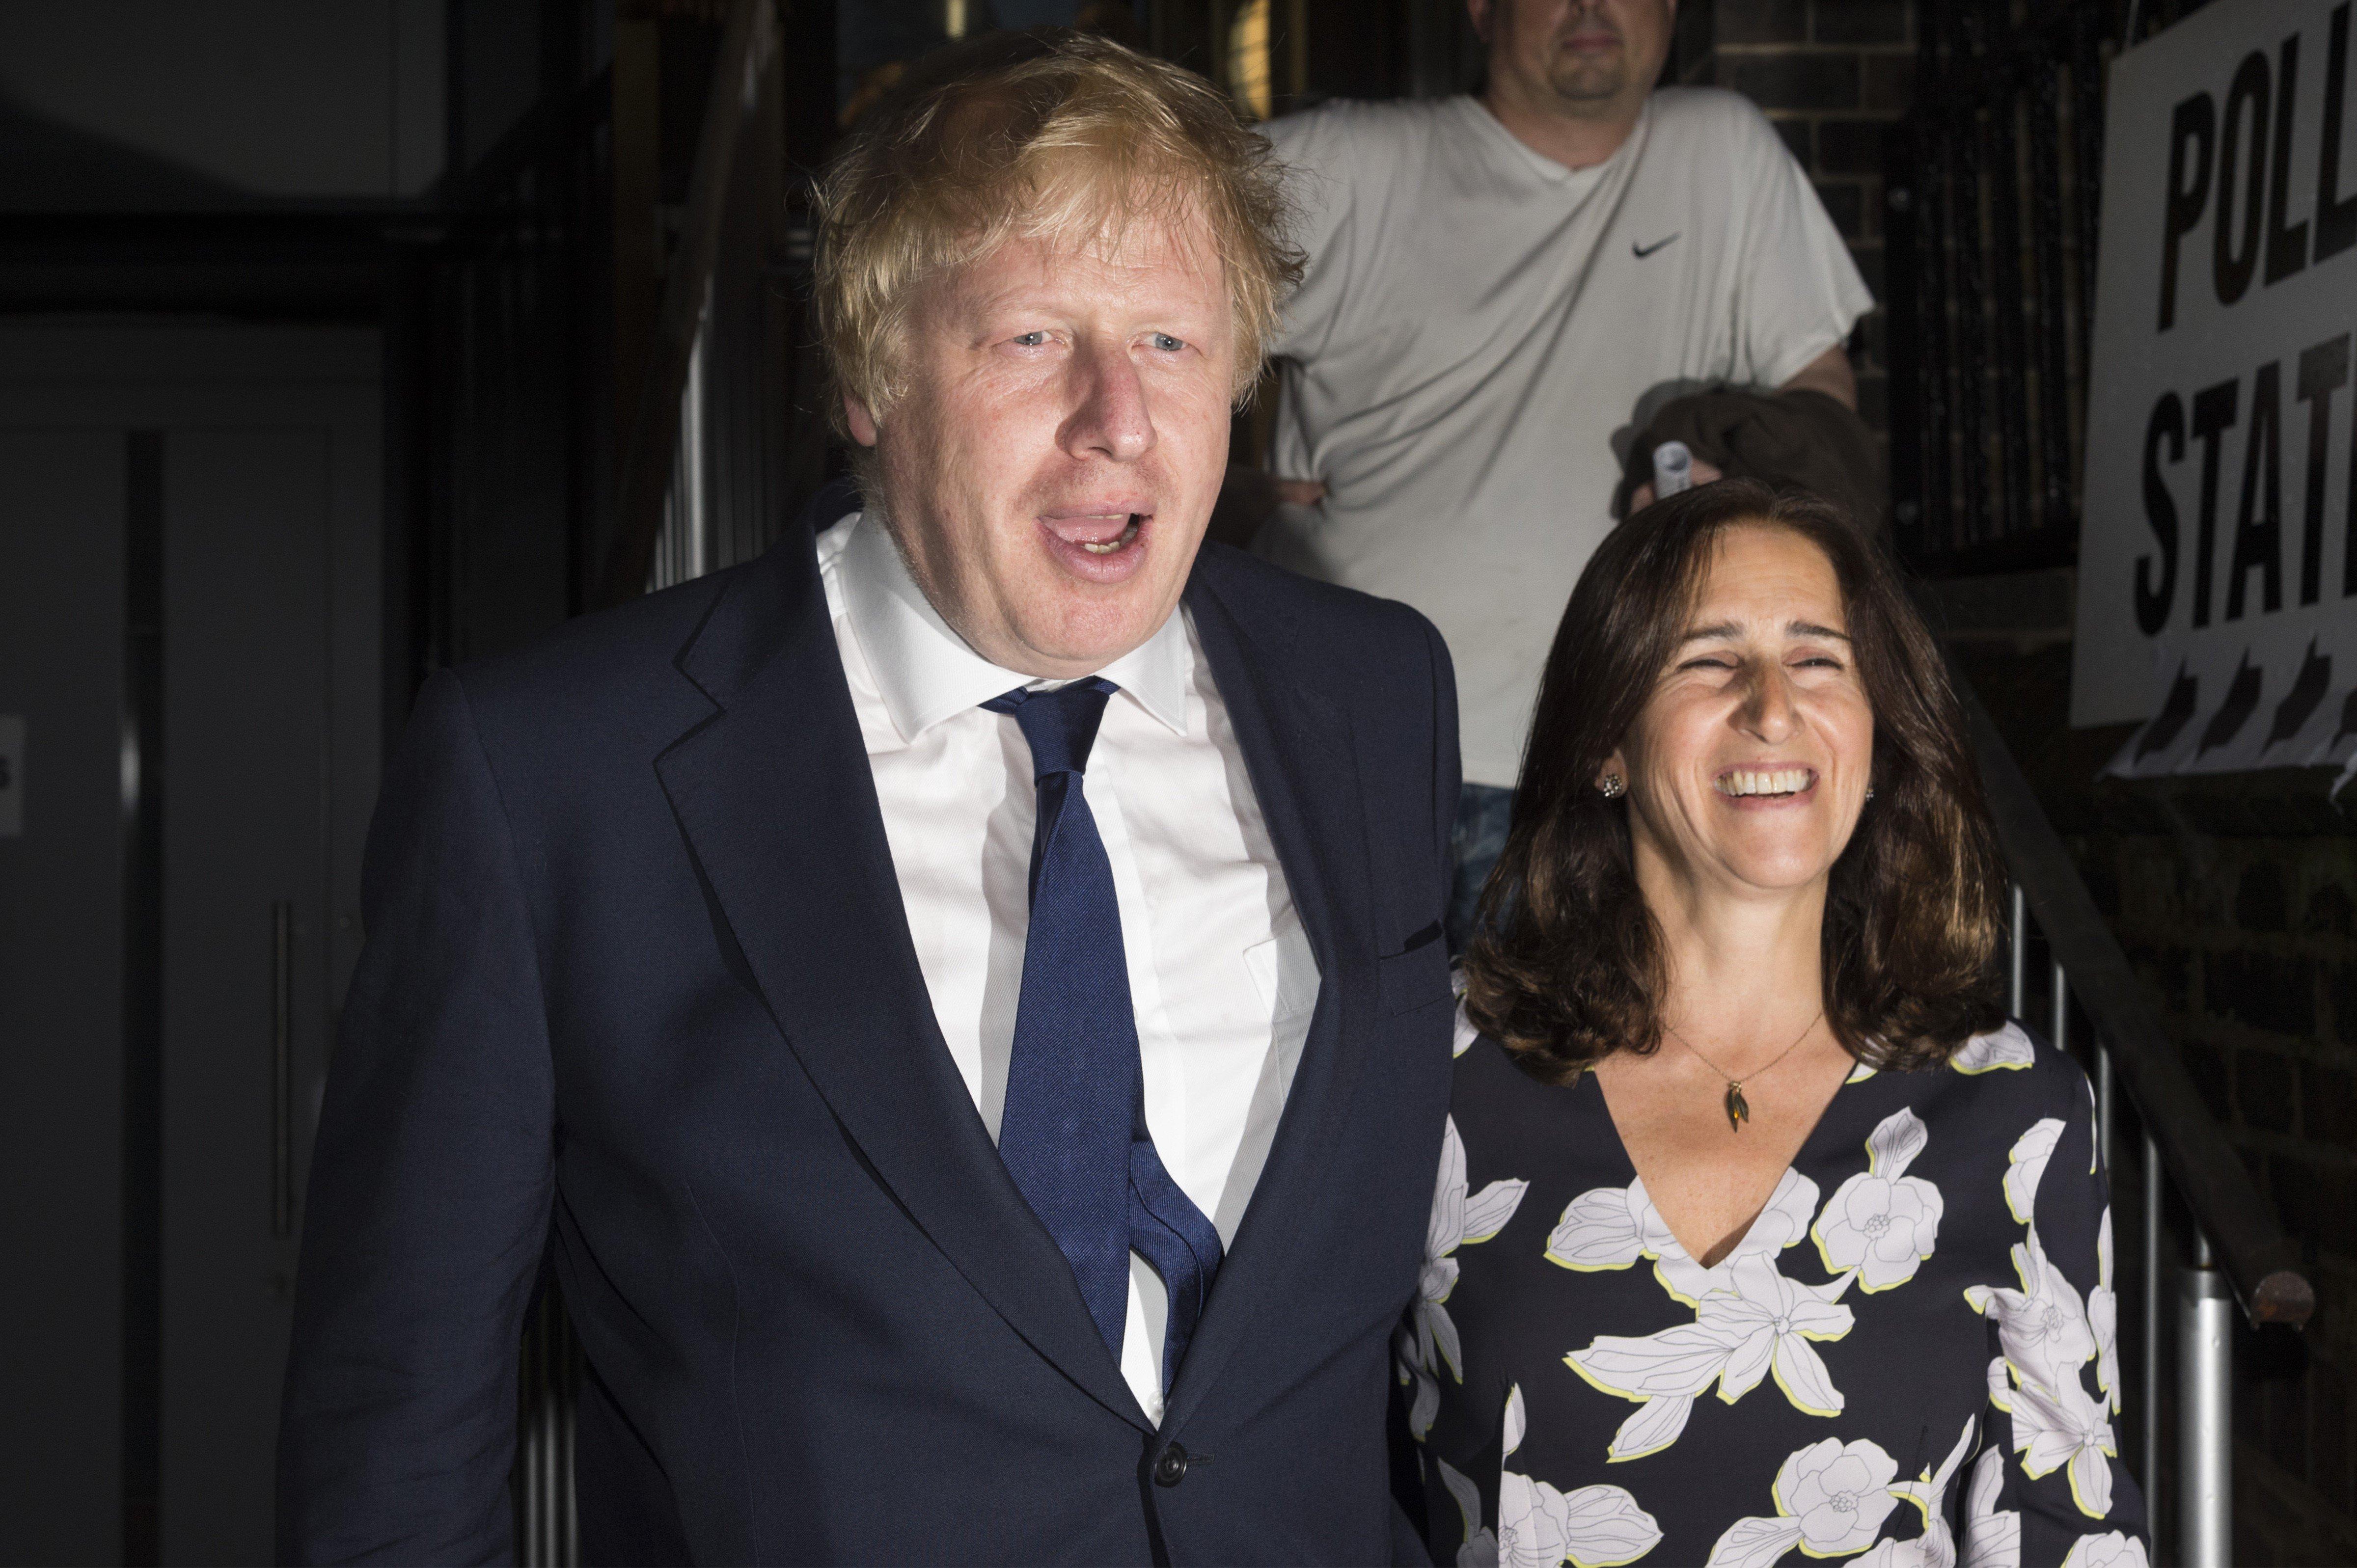 Least Surprising News Ever: Boris Johnson 'Has Another Affair', Confirms